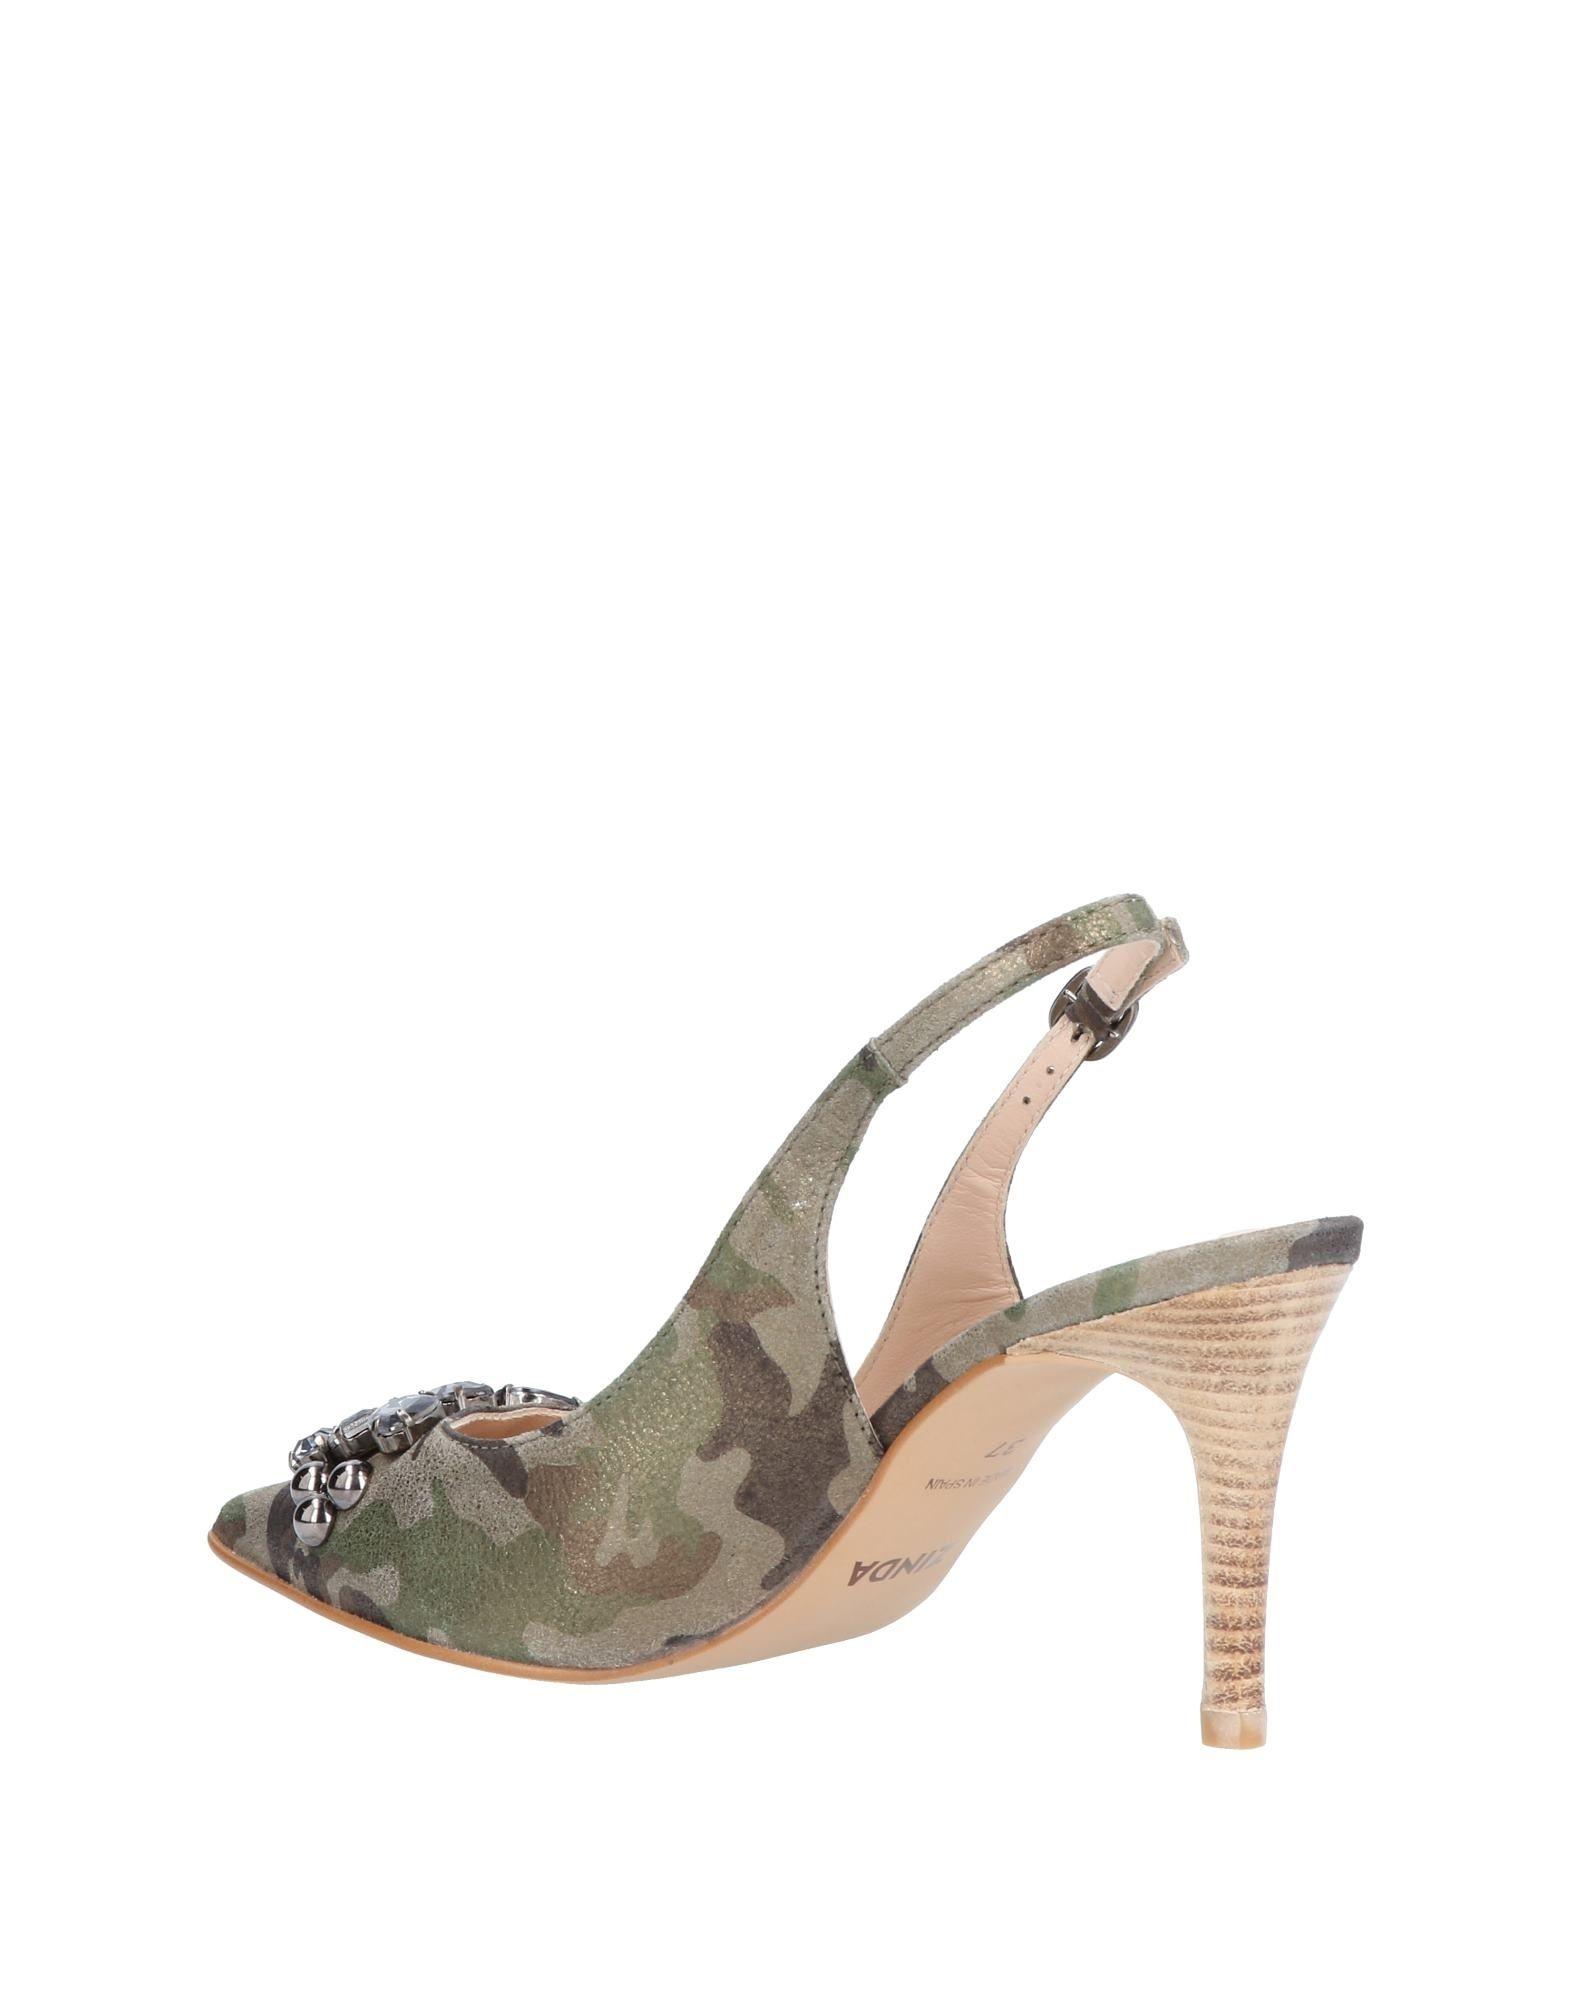 Zinda Pumps Damen  11468910QV Gute Qualität beliebte Schuhe